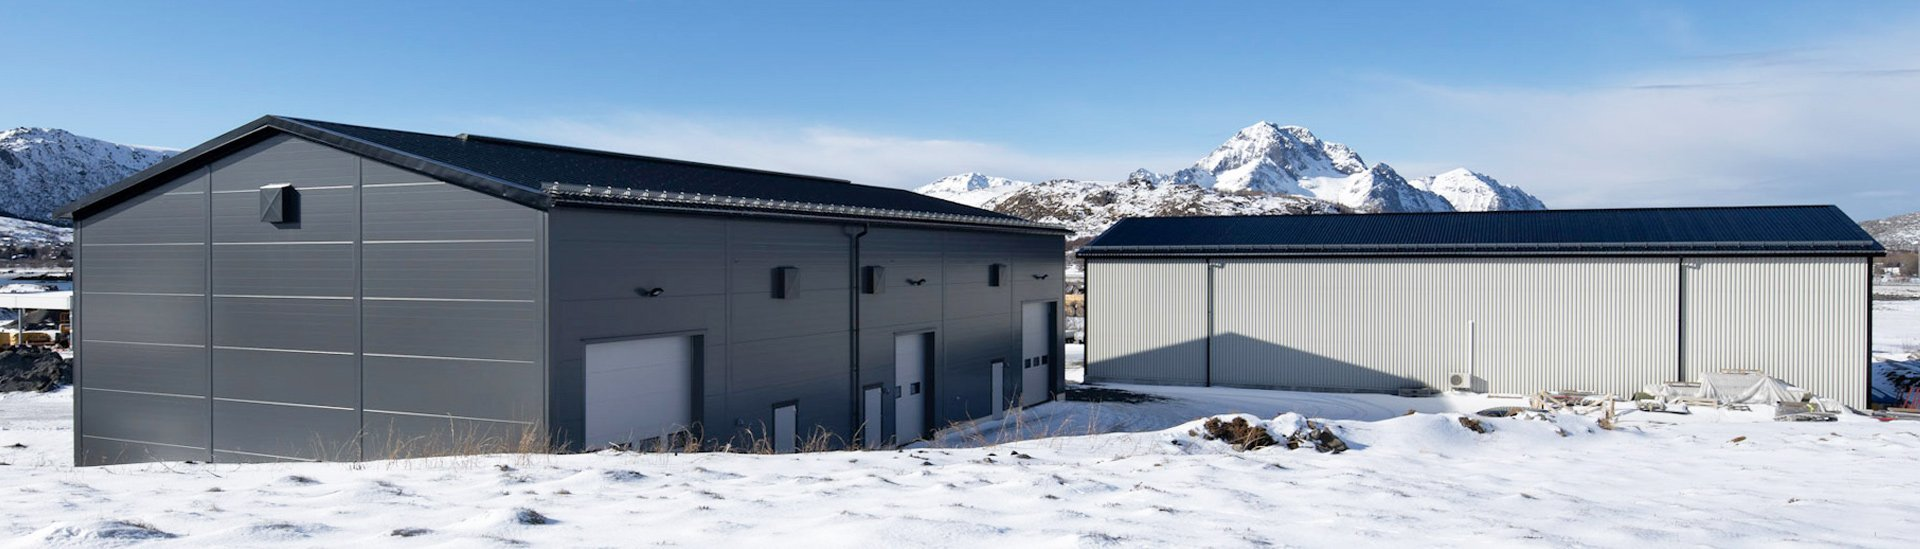 LLENTAB storage building in winter